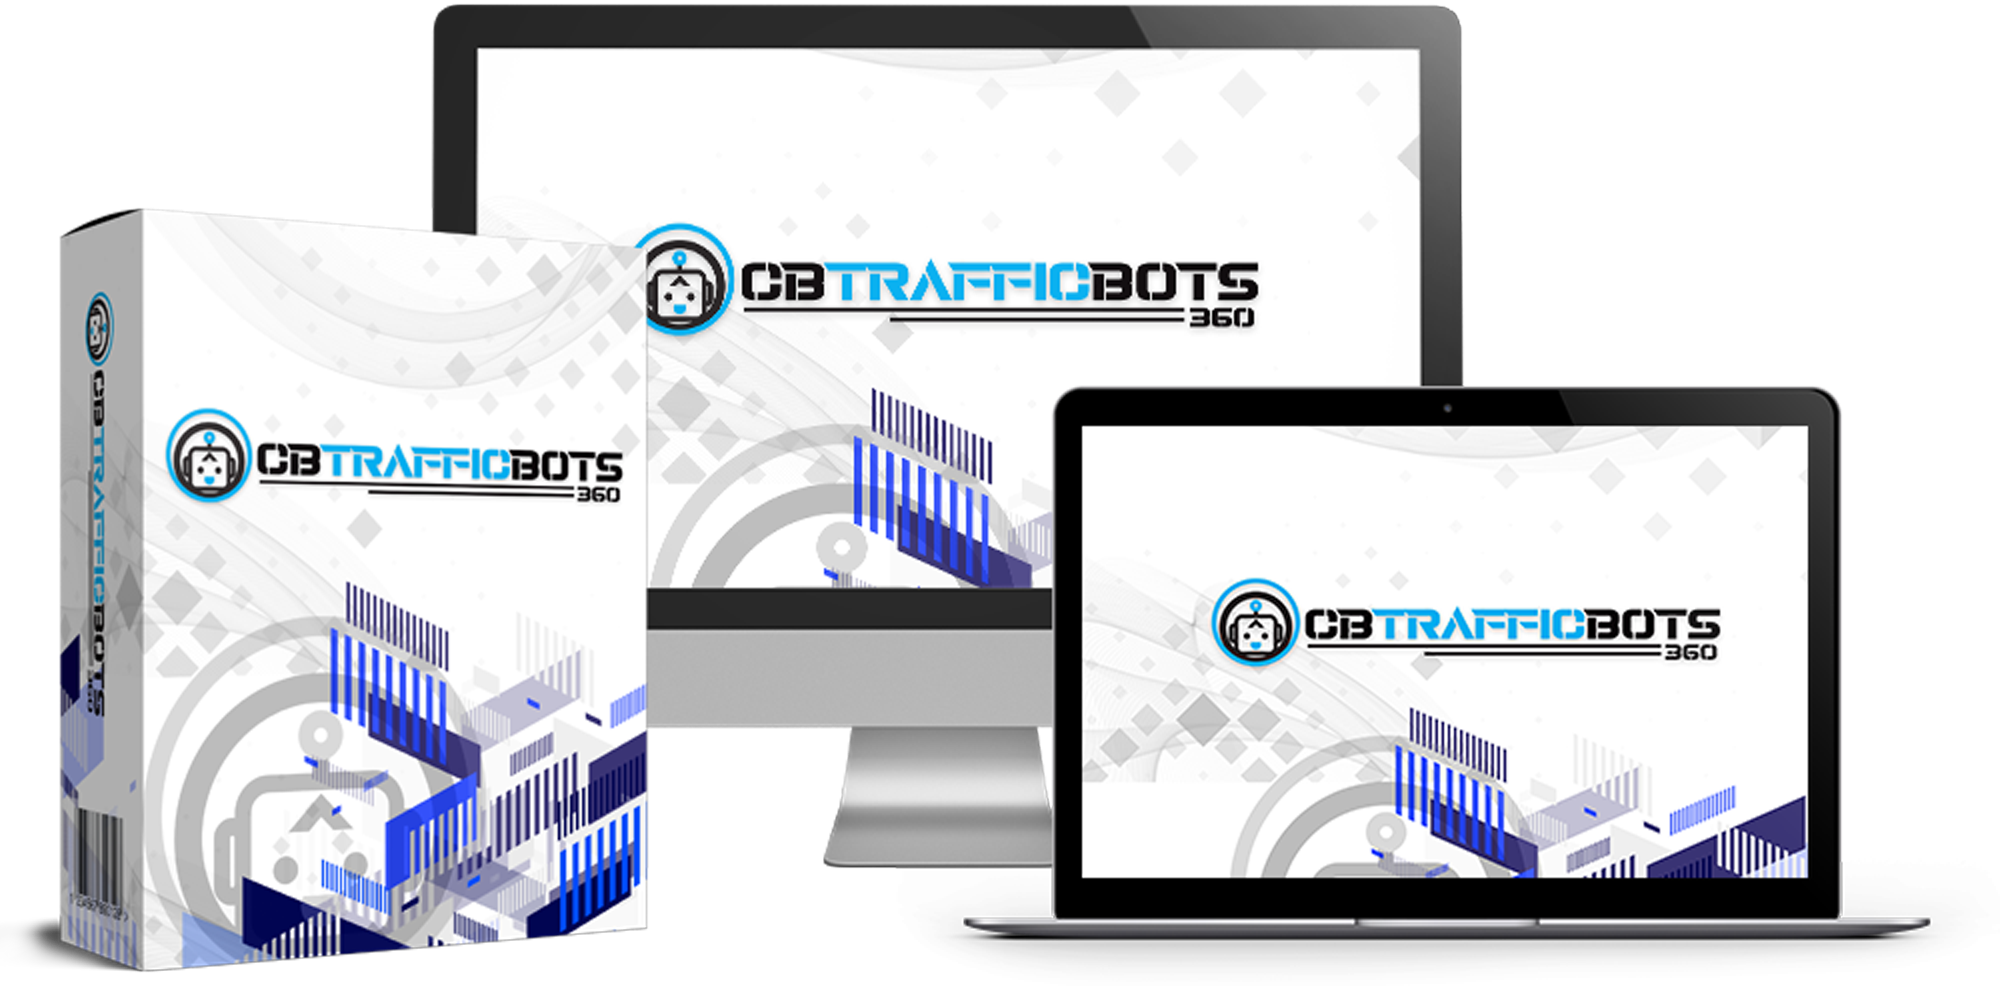 Cb traffic bots 360